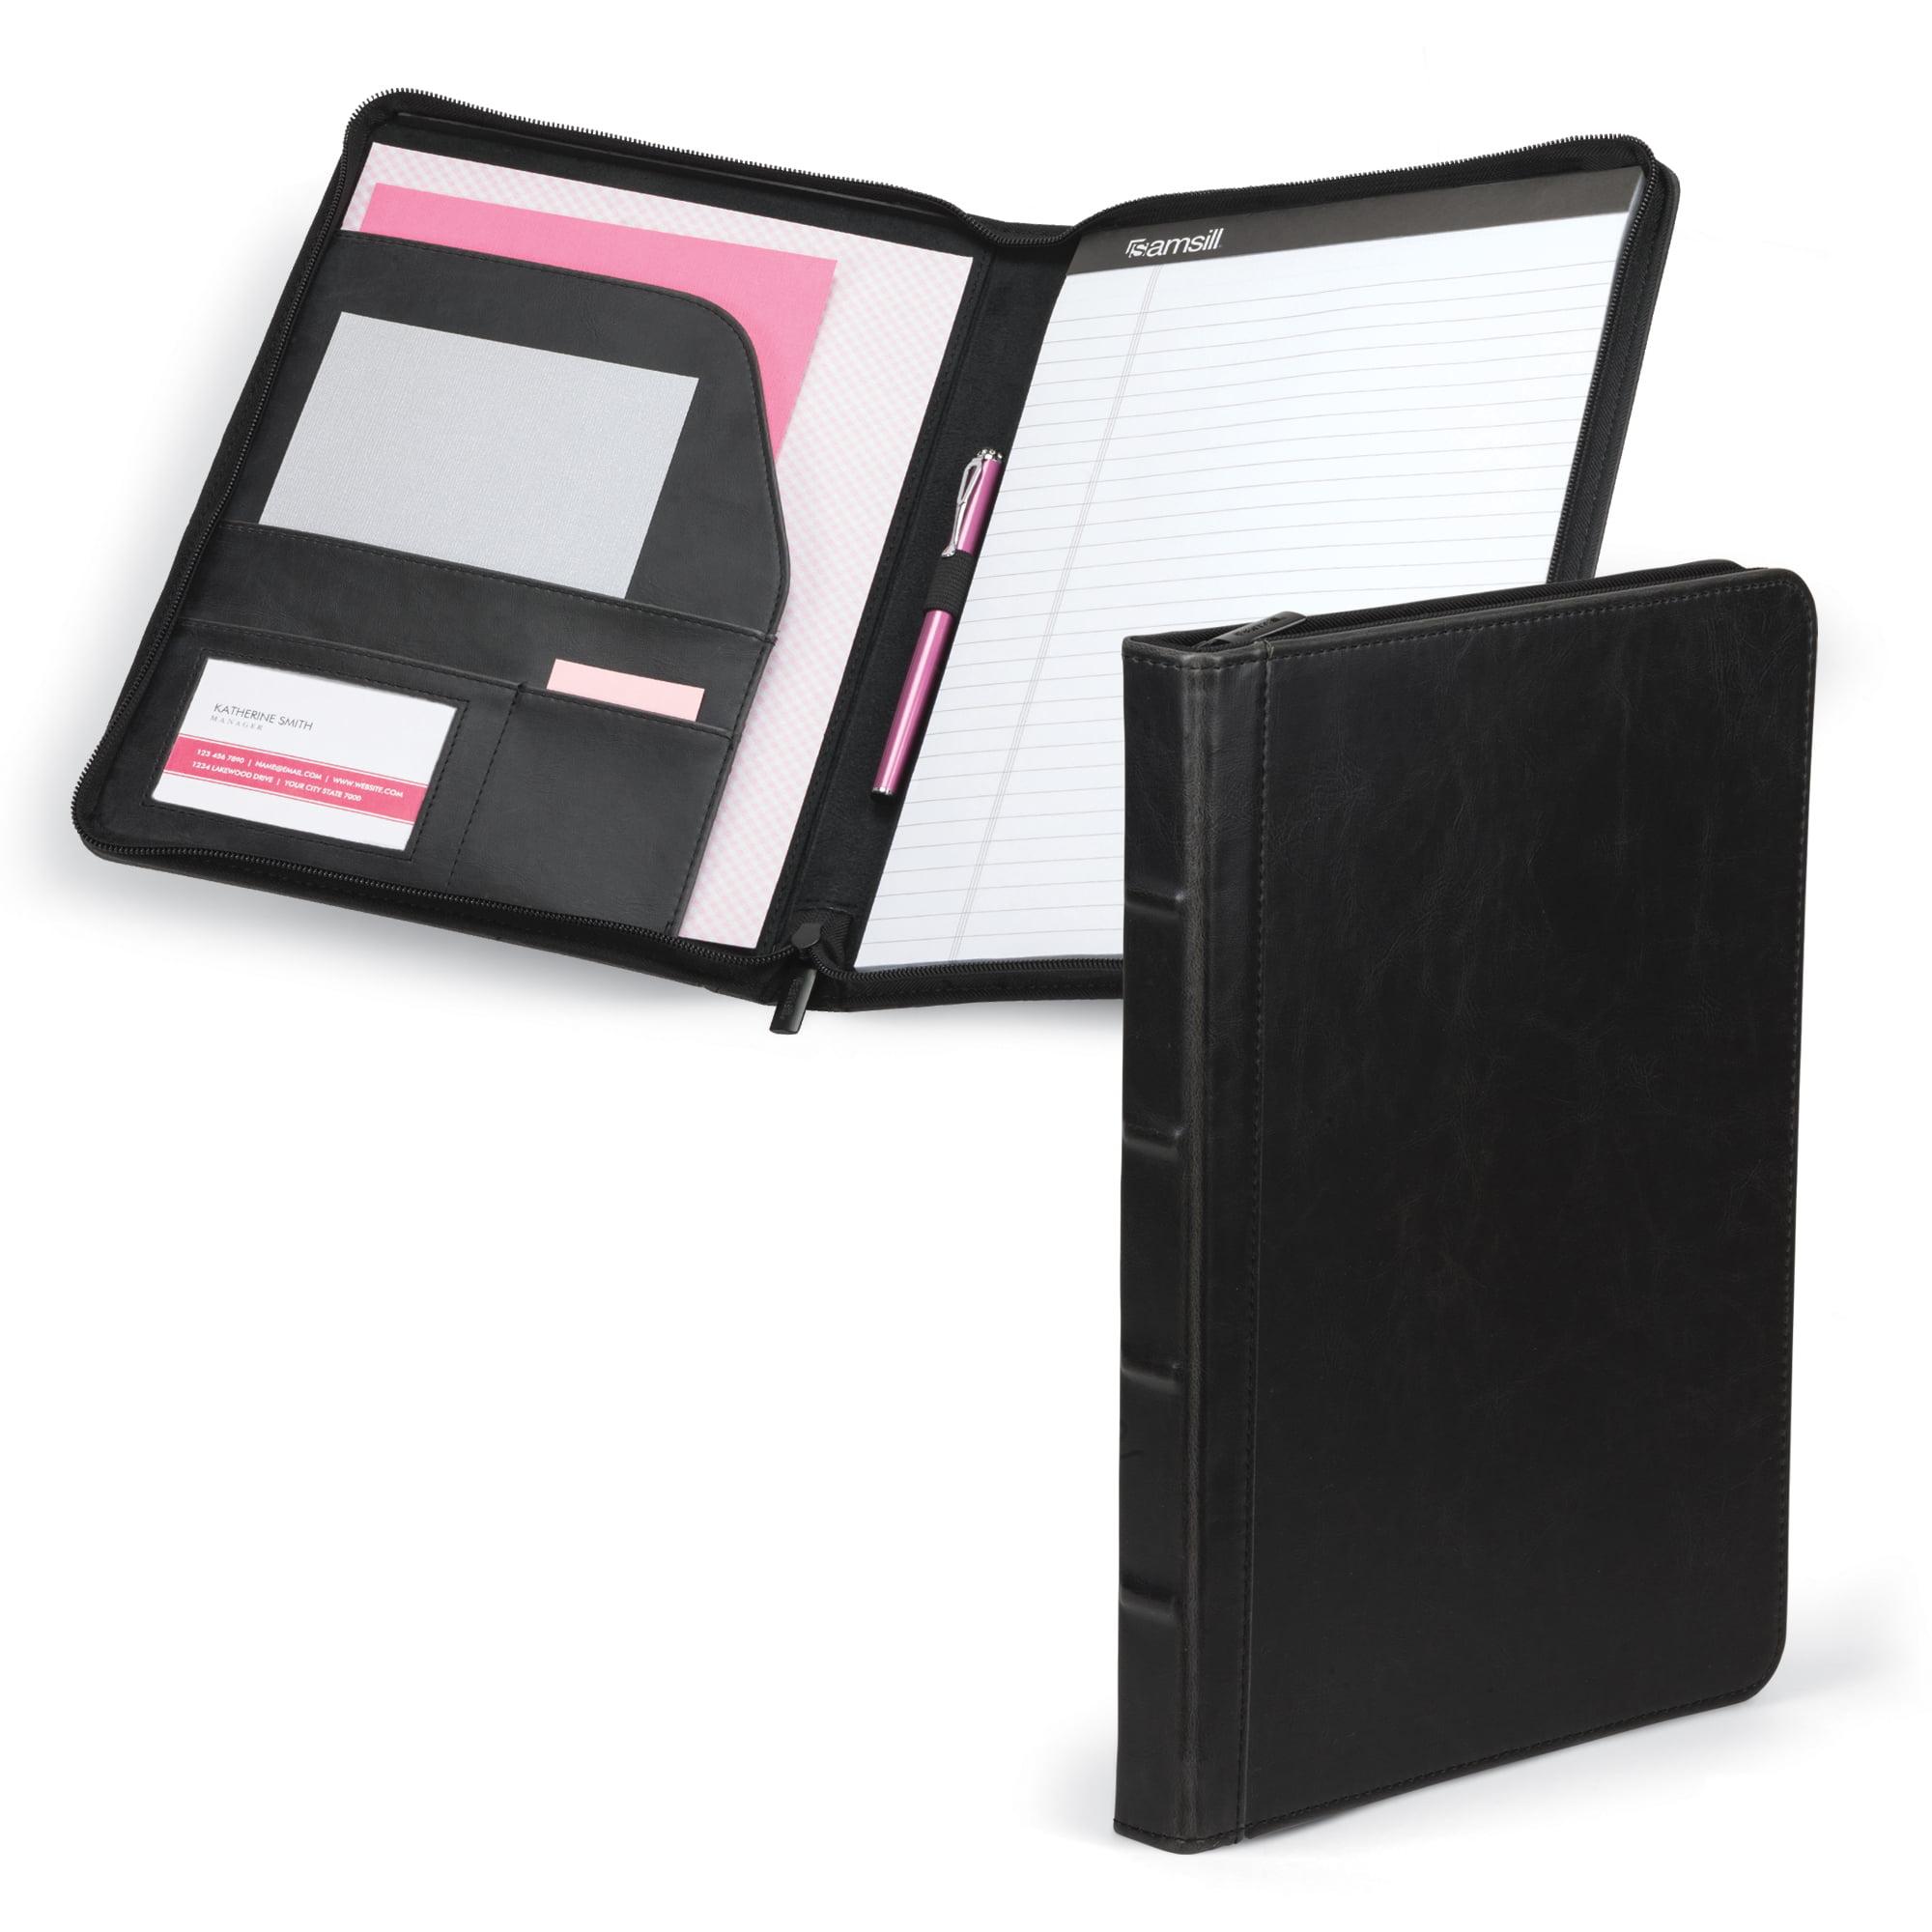 "Samsill Vintage Hardback Zipper Padfolio, 8.5""x11"" Writing Pad Included, Dark Brown"